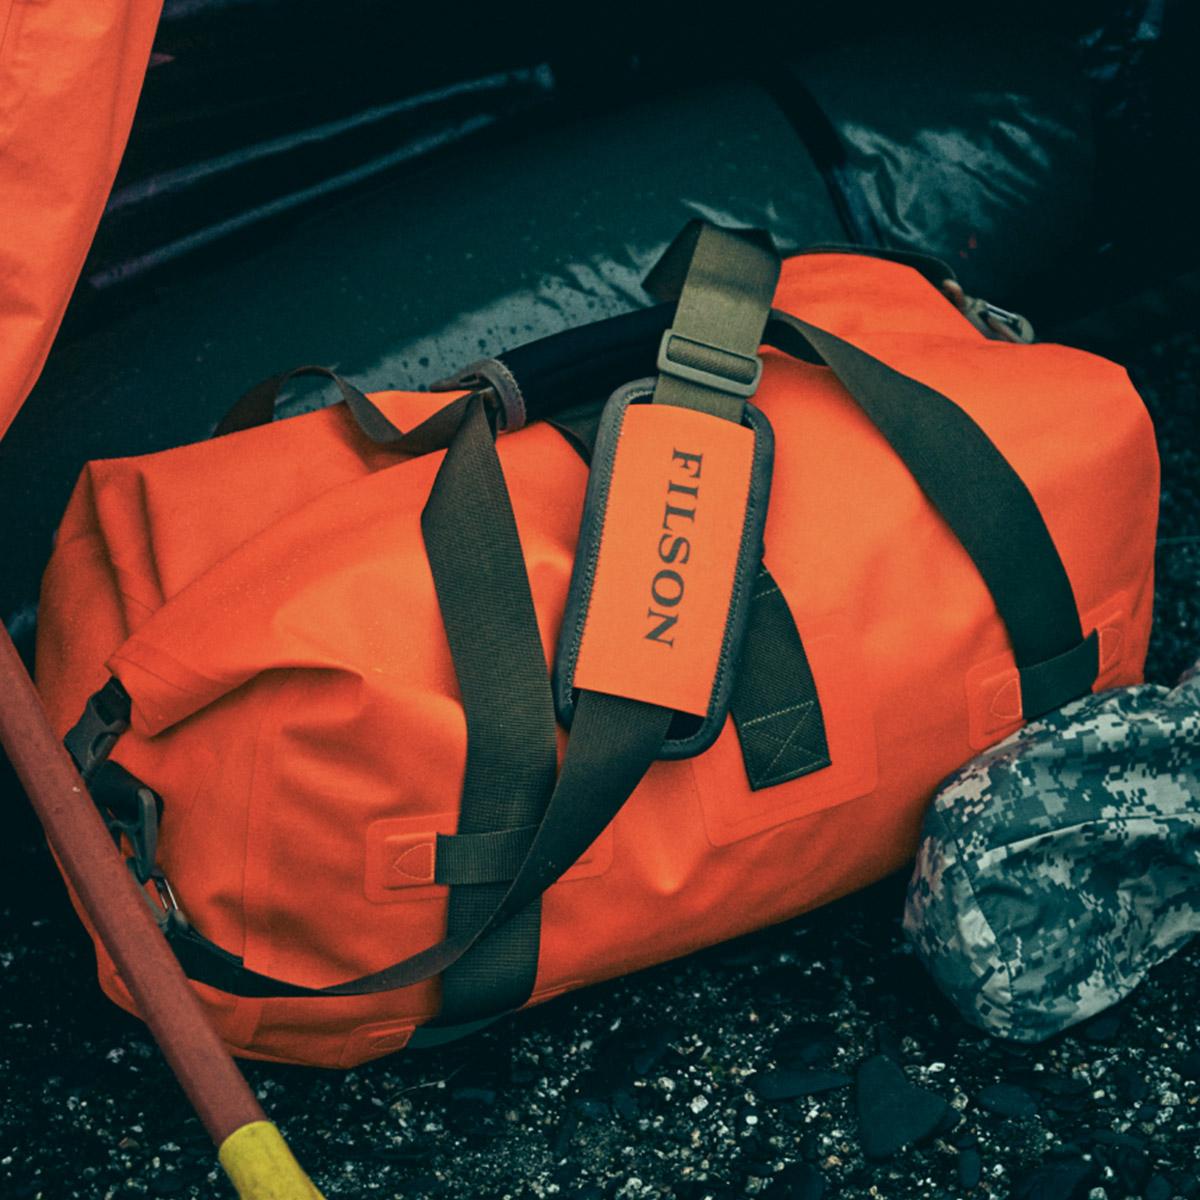 Filson Dry Duffle Bag Medium Flame, houdt je spullen droog in elke extreme weersomstandigheid